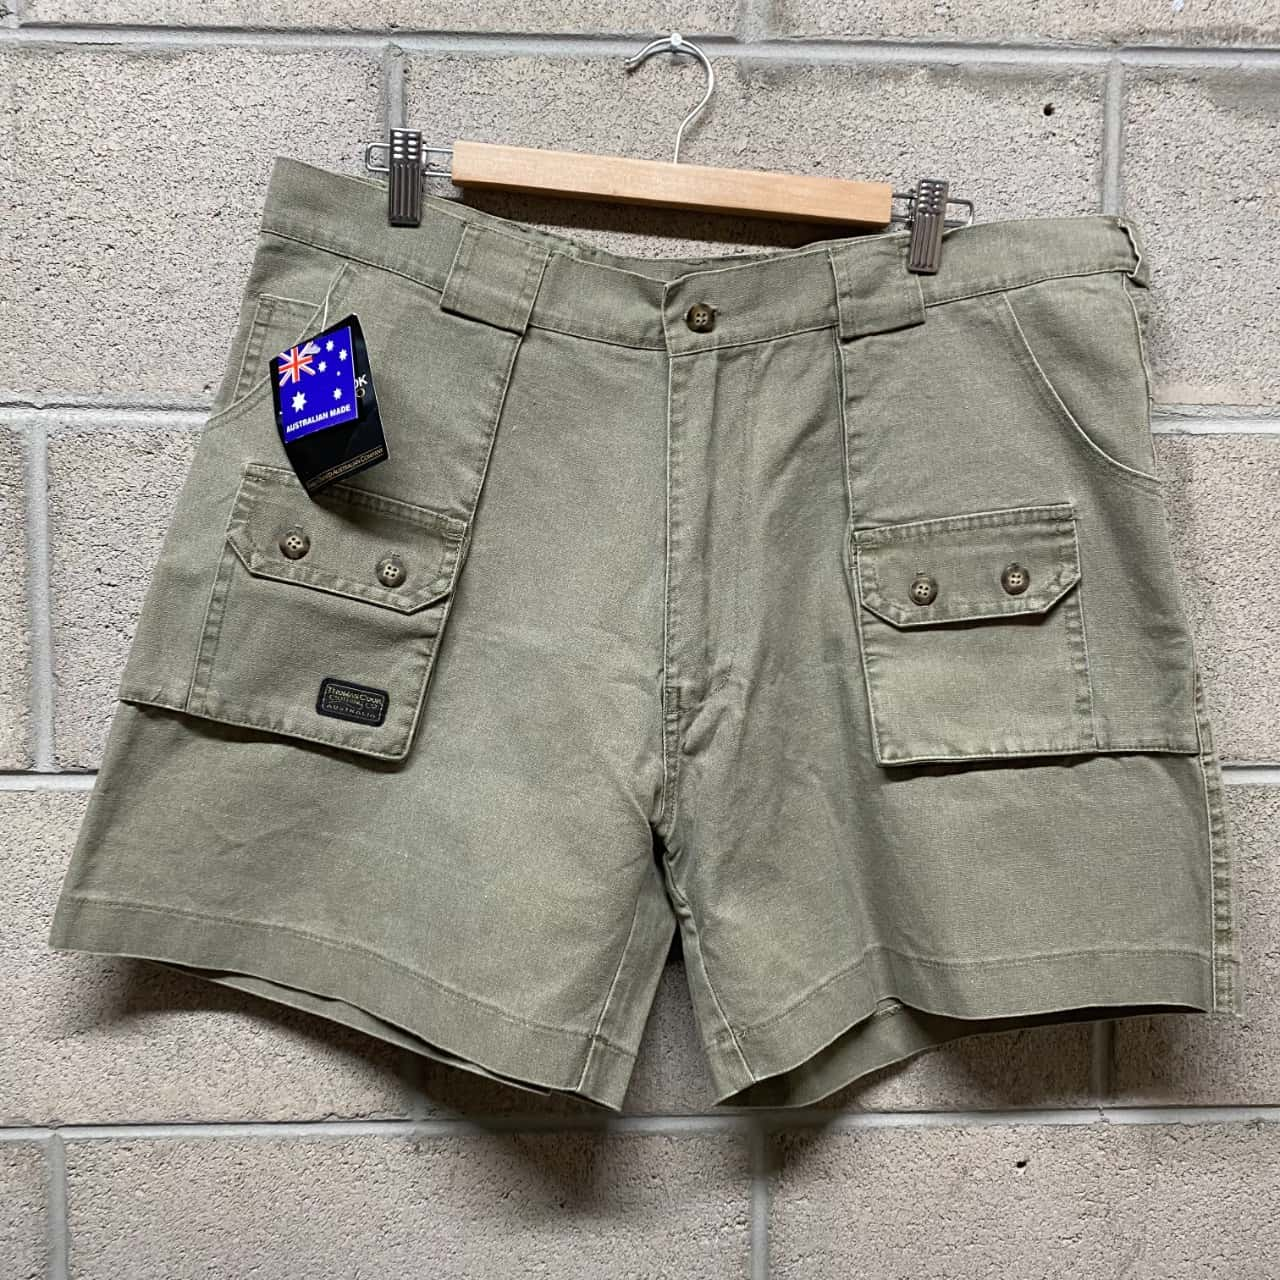 Thomas Cook Mens  Shorts Size 38 Green/ Khaki BNWT